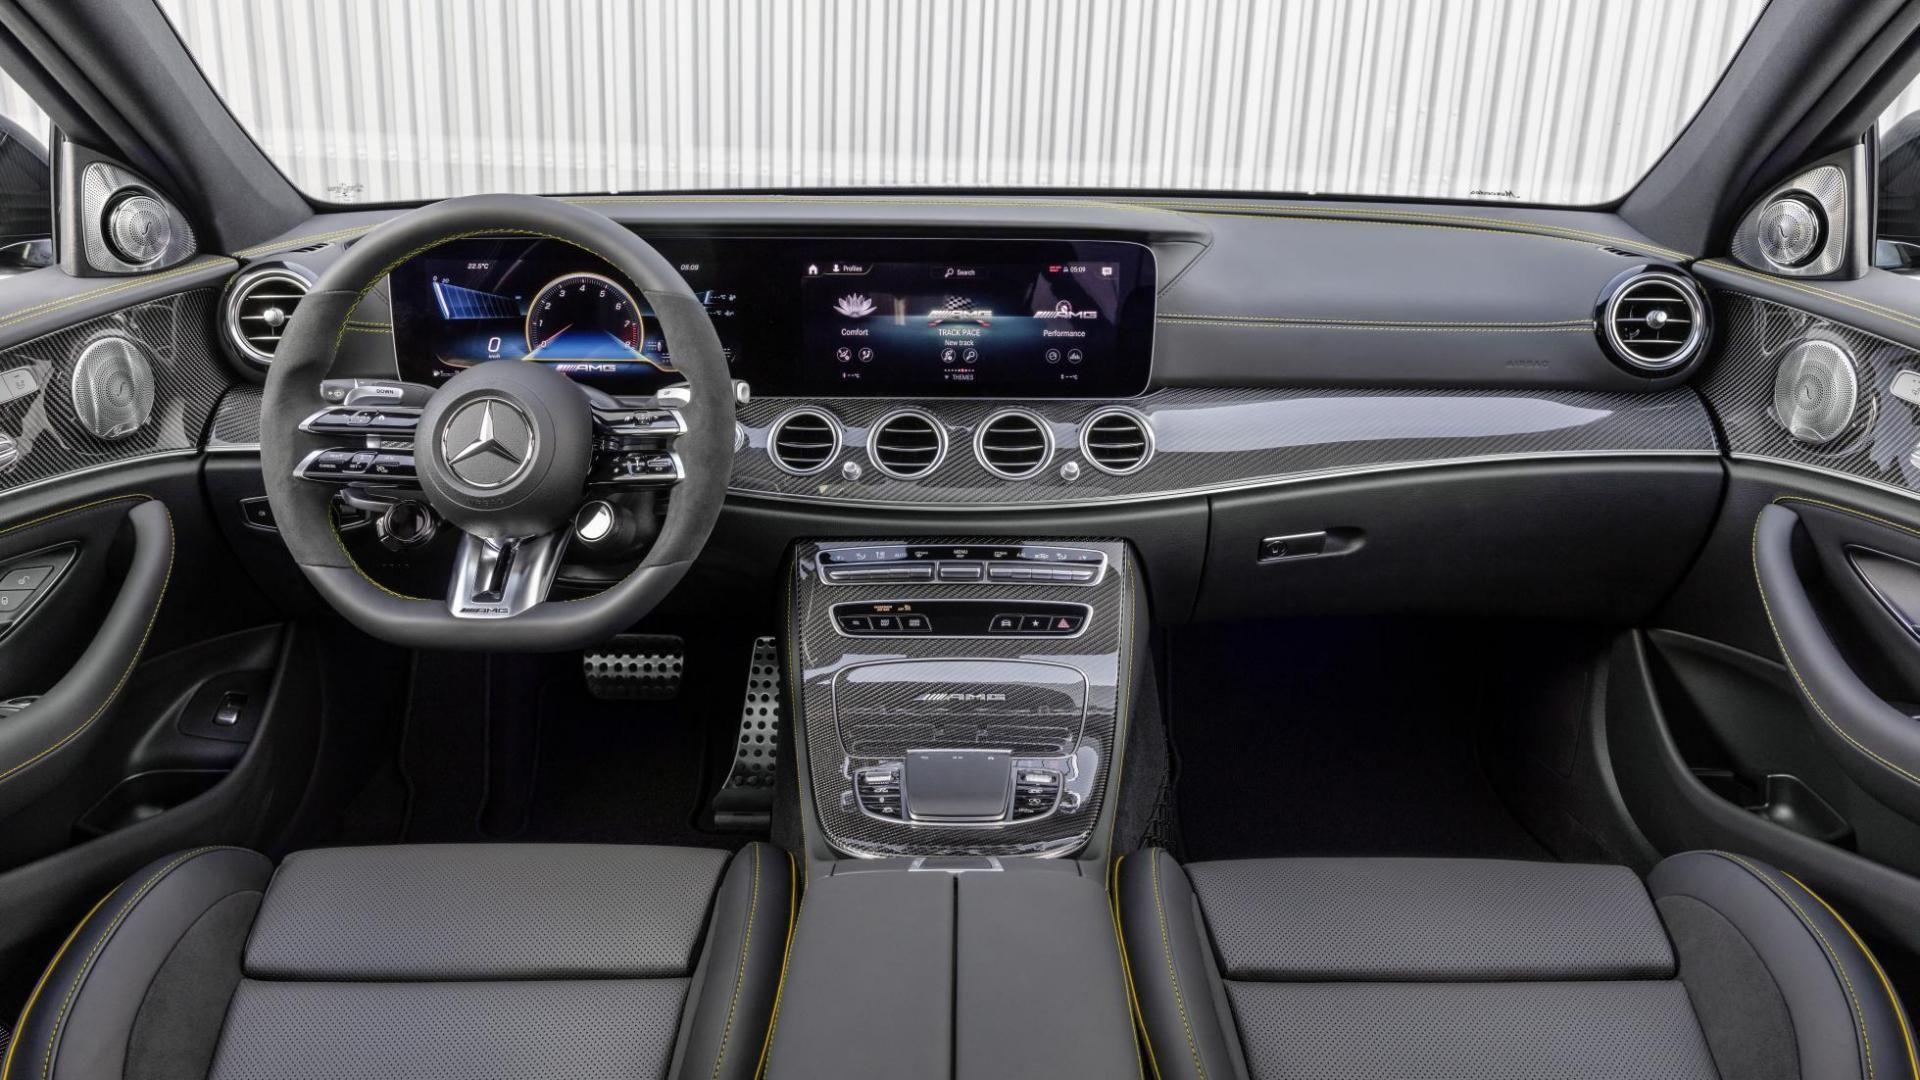 dashboard-mercedes-amg-e63-s-facelift.jpg